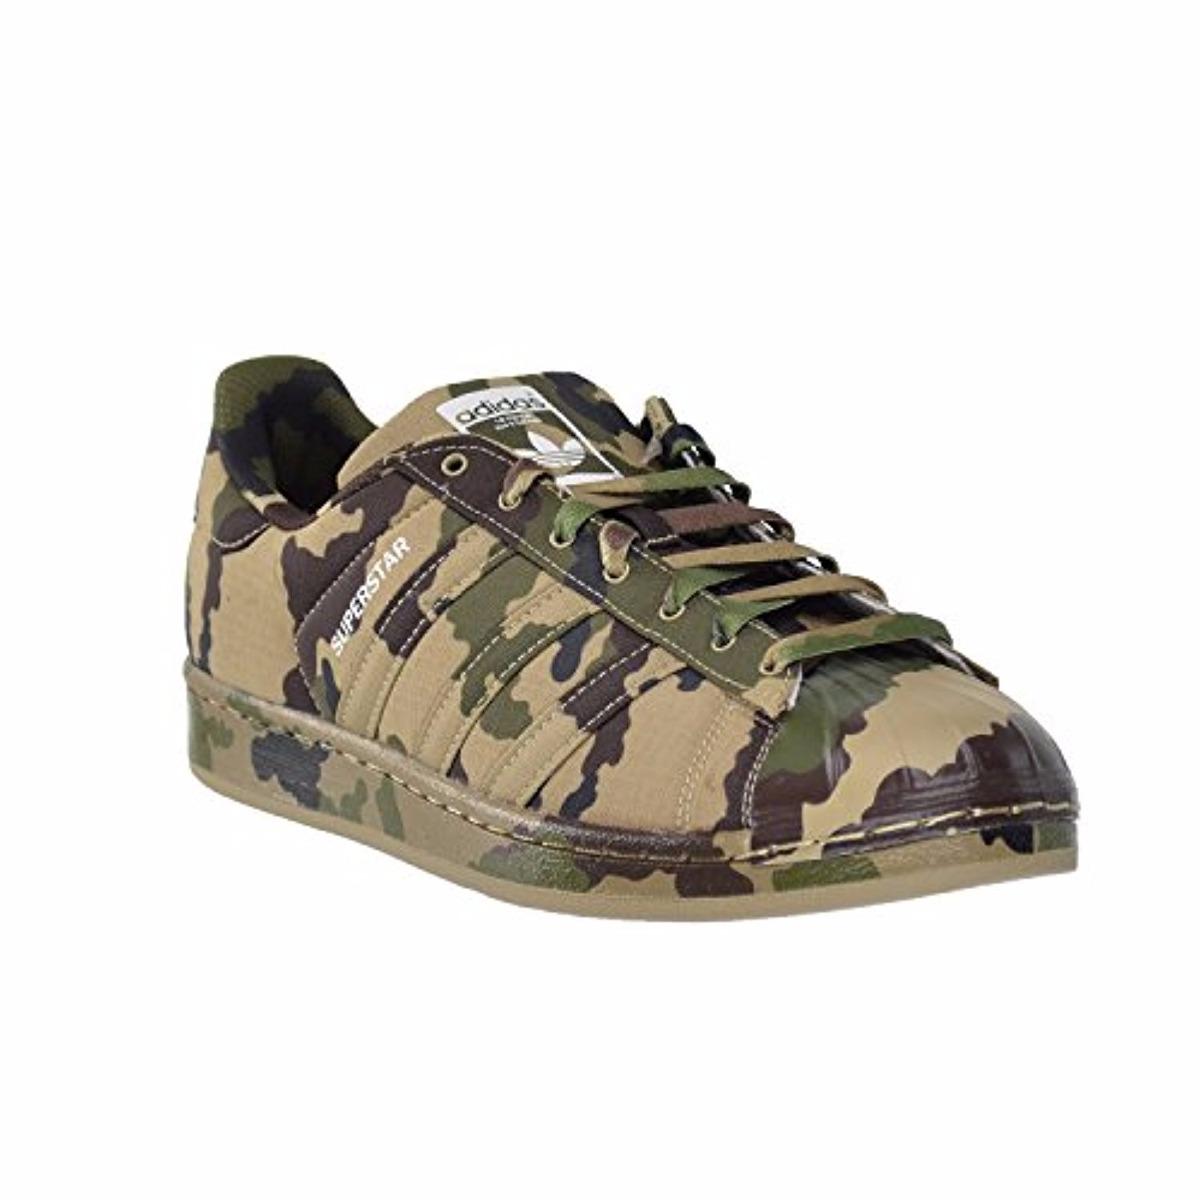 Zapatos 8 Superstar 5us Originales Adidas Camuflaje fyIg76vYbm